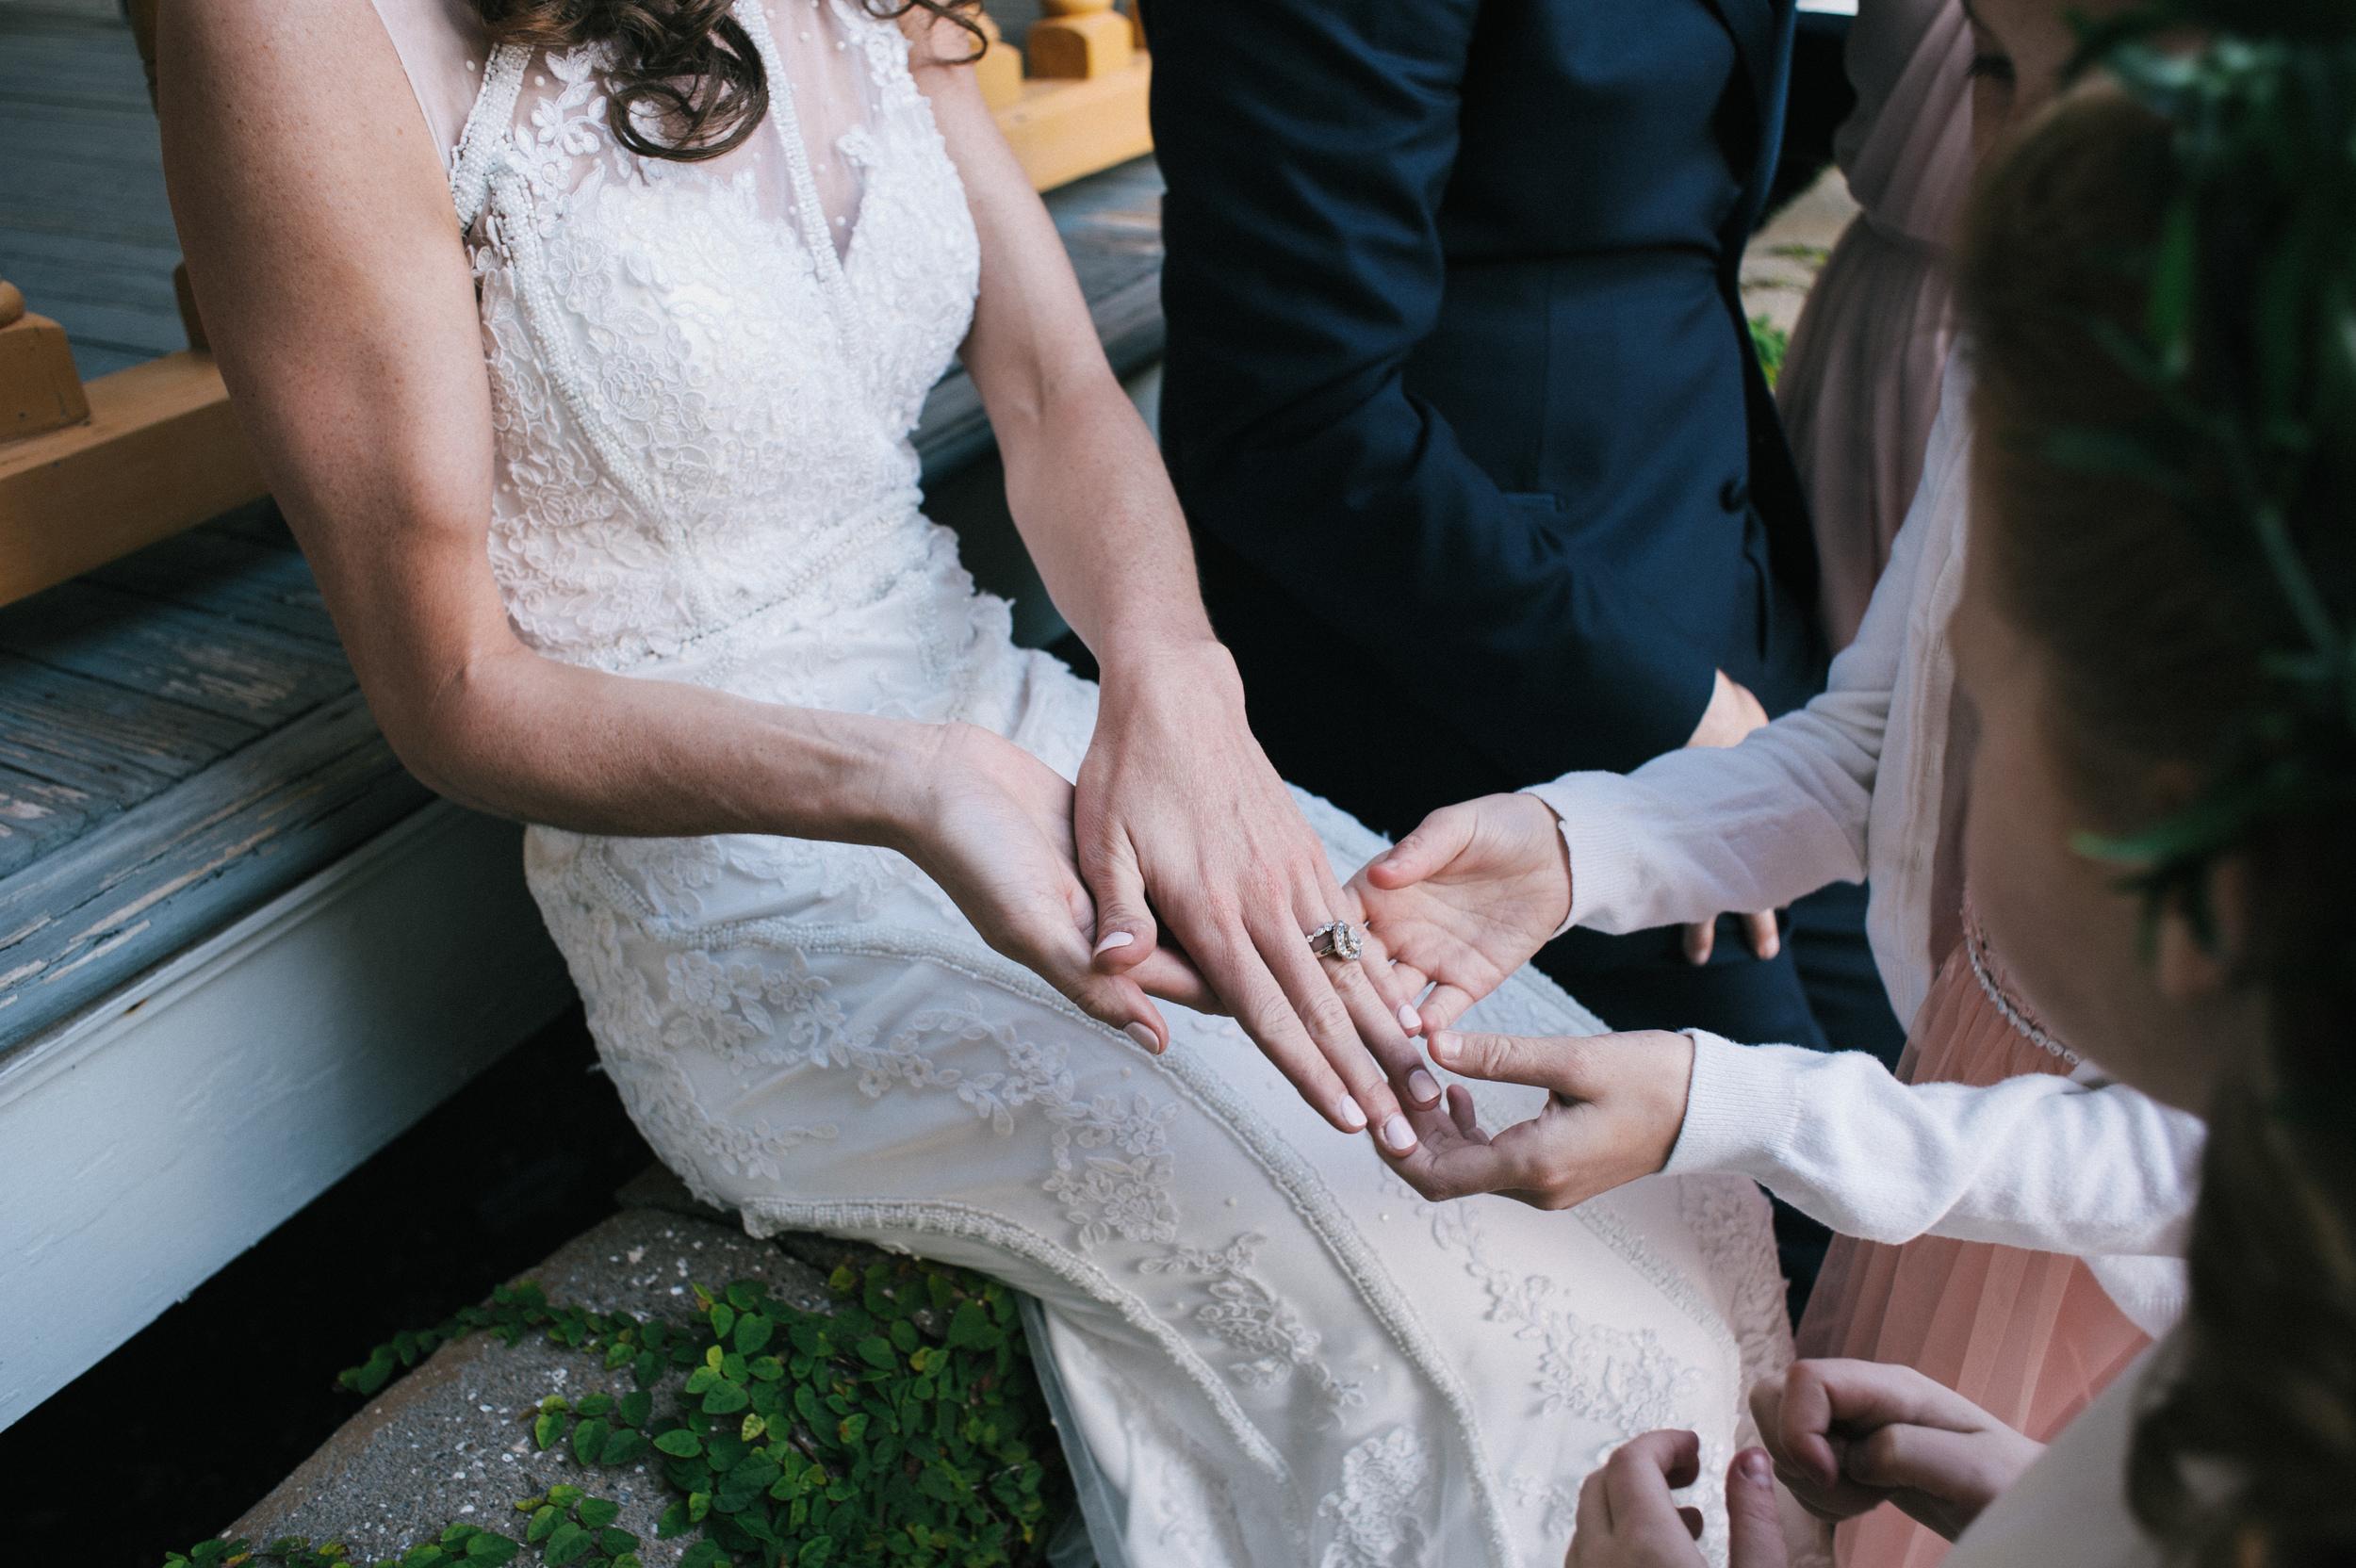 kadi-and-matt-carroll-april-9-2016-jekyl-island-wedding-m-newsom-photography- (543 of 744).jpg